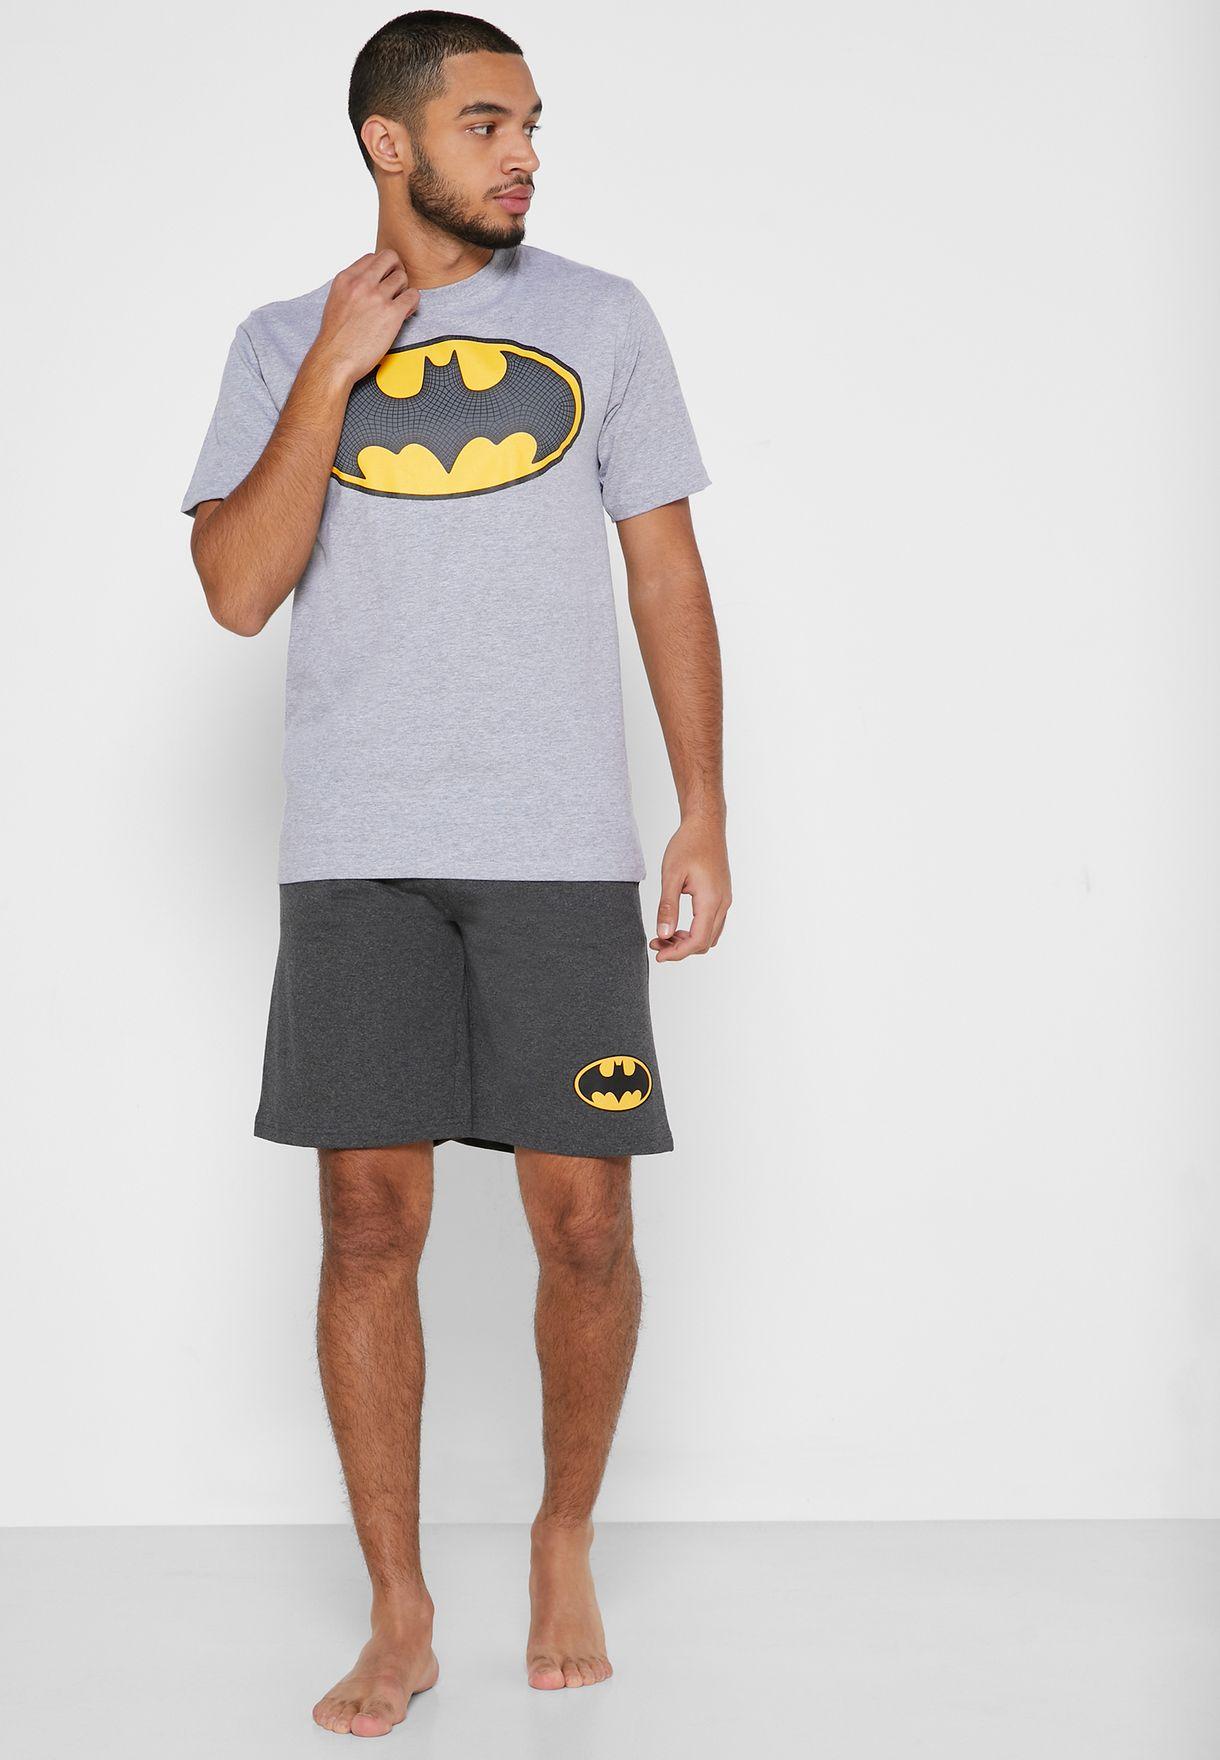 Batman Badge PJ Set